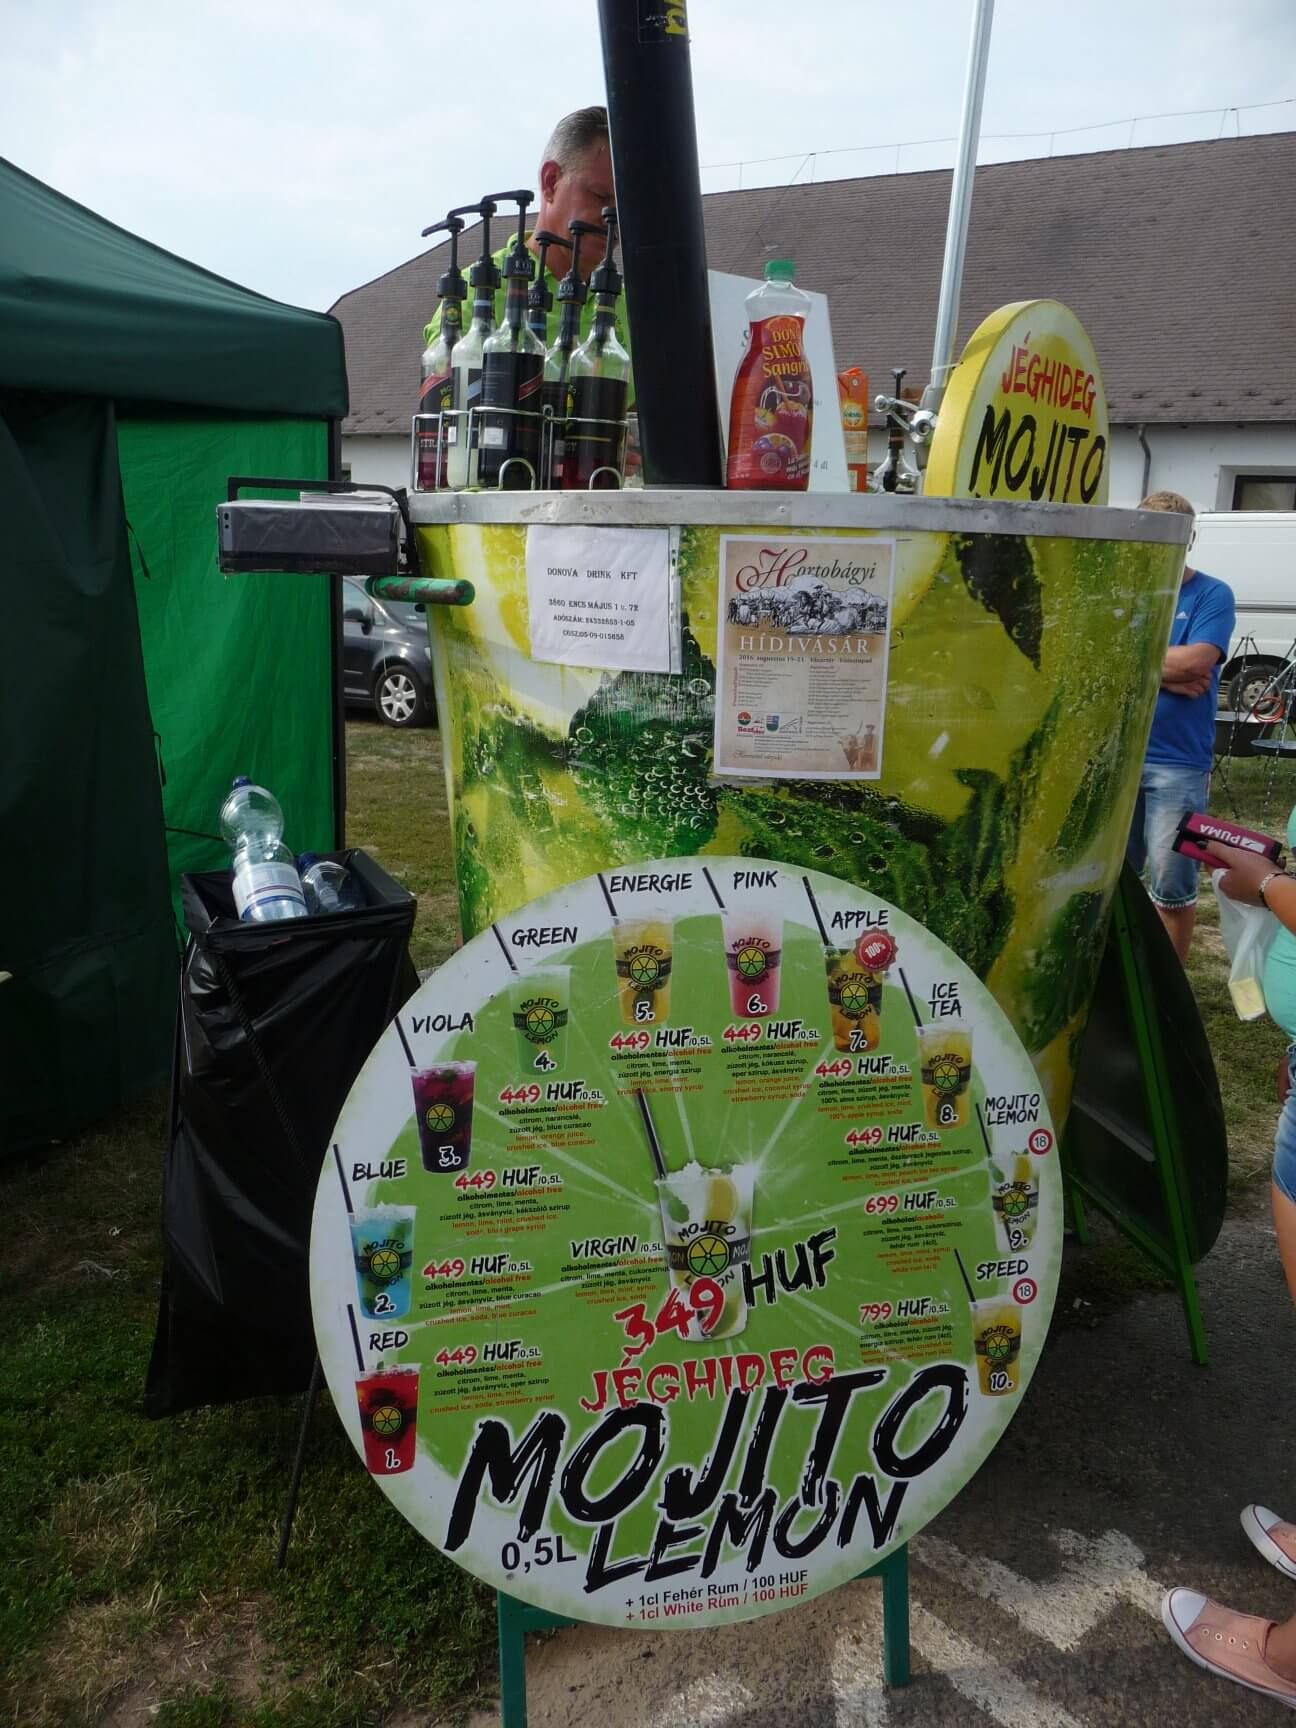 Mojito-Stand, Brückenmarkt Hortobágy